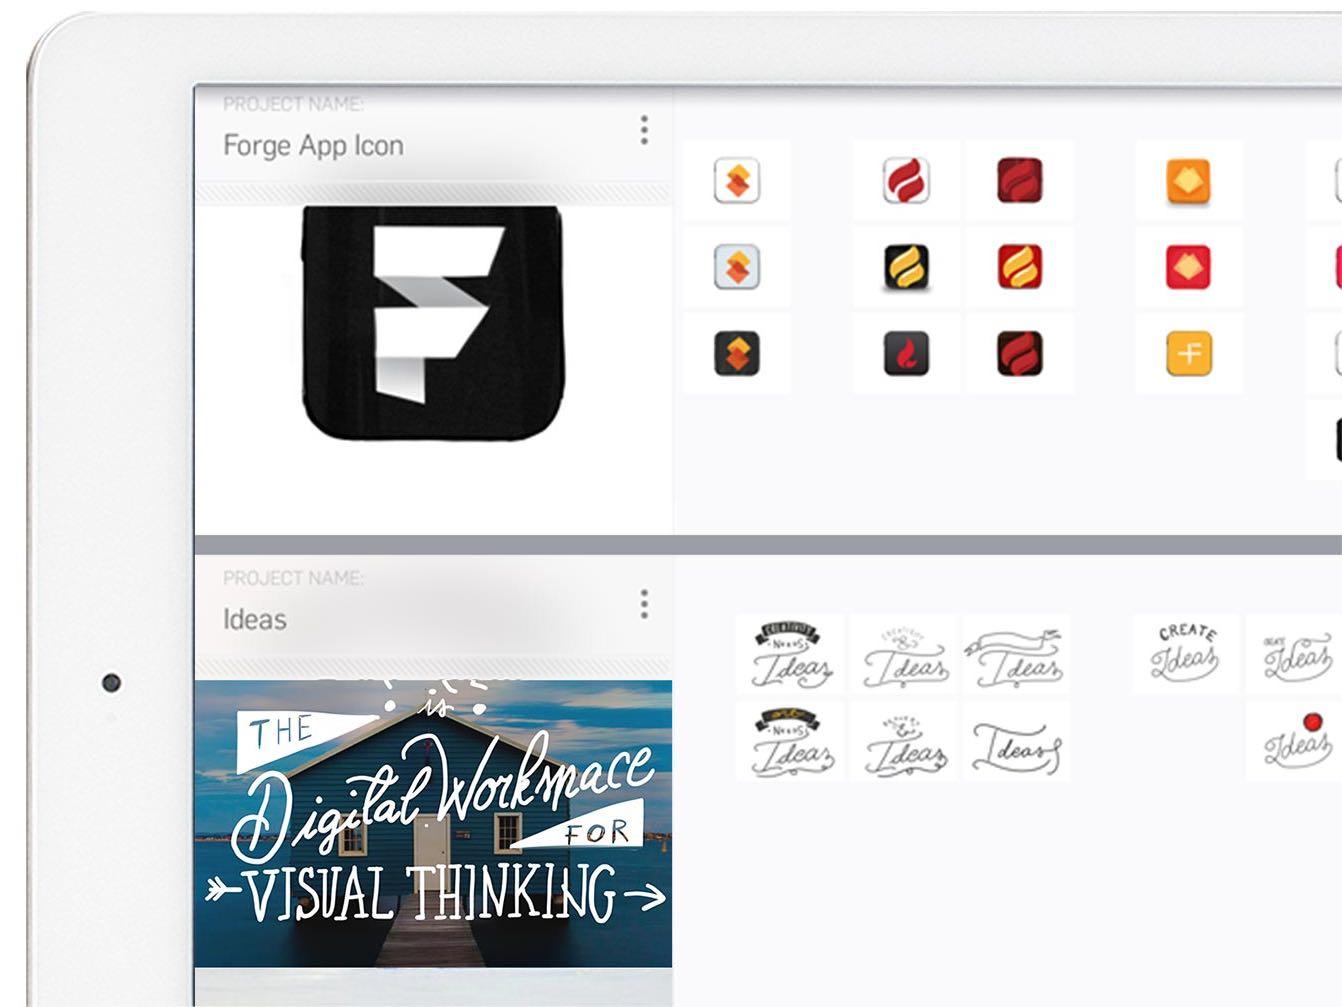 Captura de pantalla 003 de Forge by Adonit 1.0 para iOS iPad